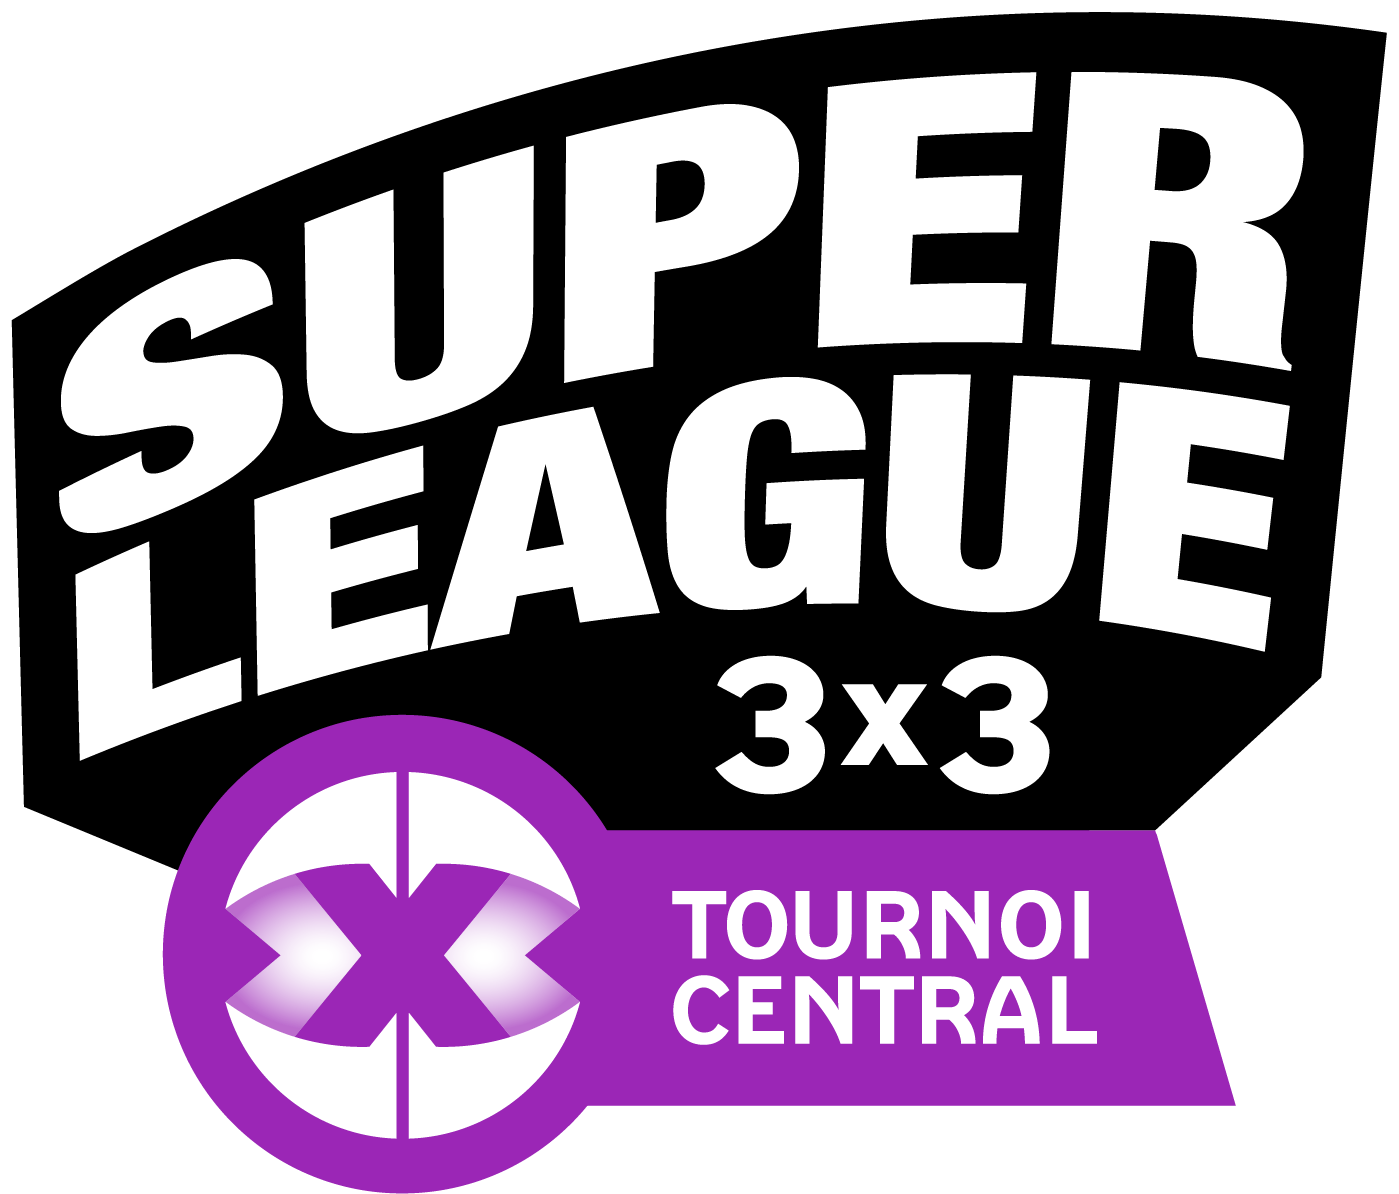 Logoffbb 3x3 tc liseret rvb